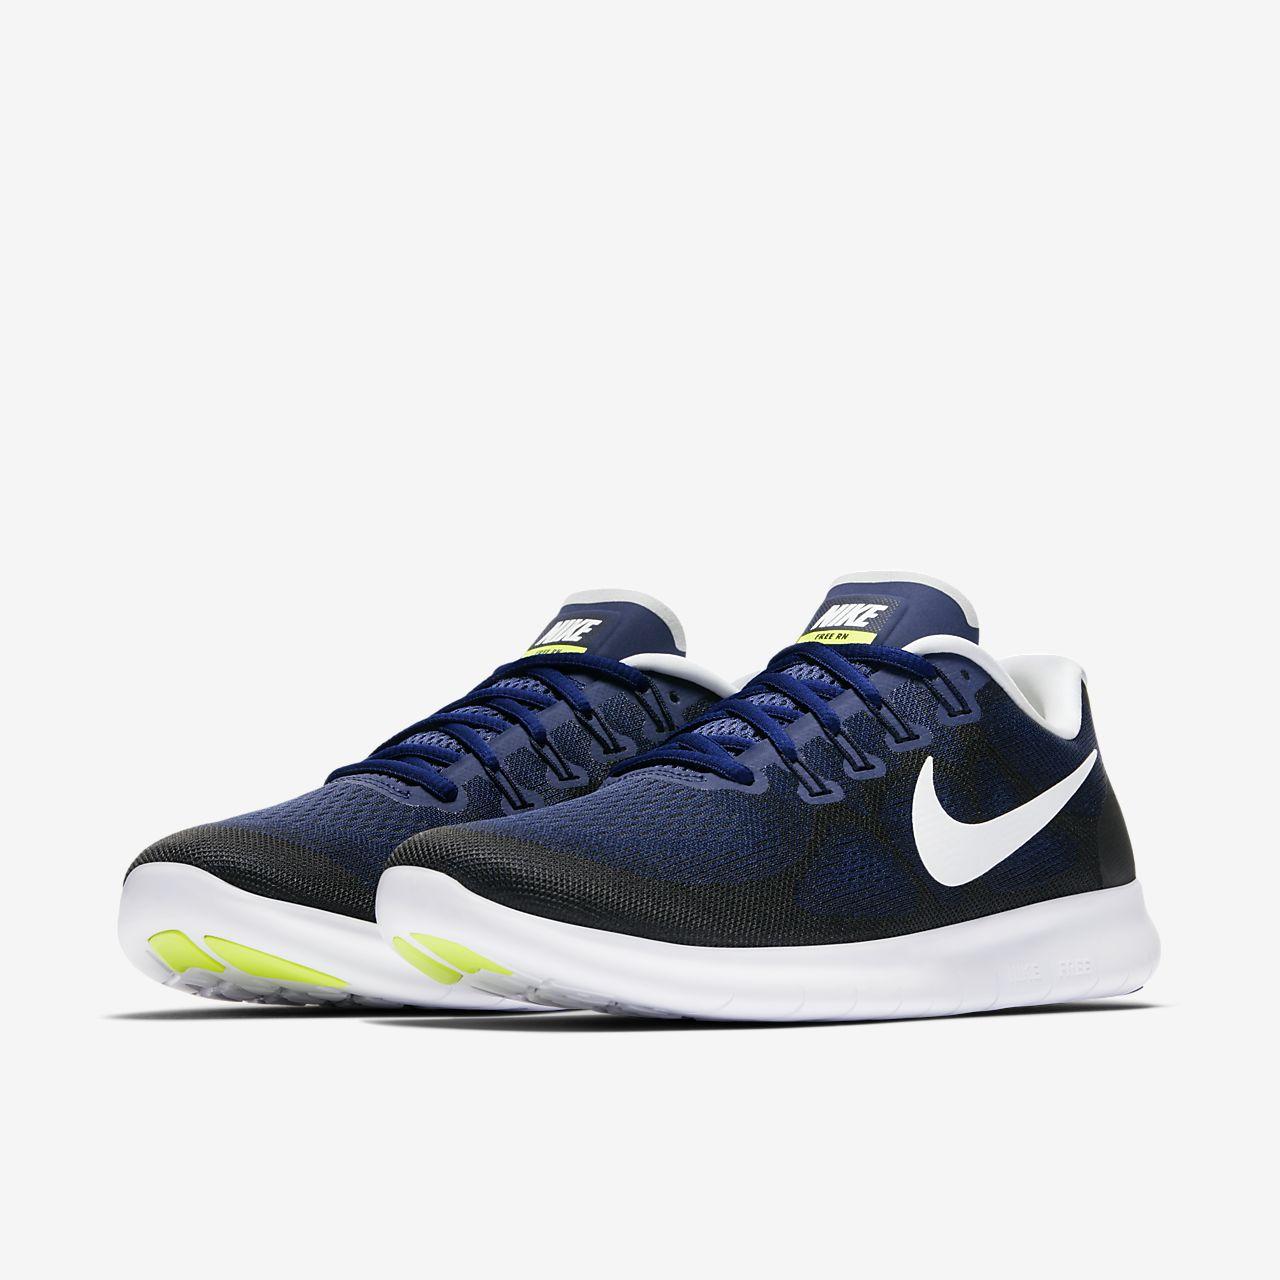 c6e8f2db37452 ... 2 Royal Blue Navy White 880740 001 Mens Running Shoes ... Nike Free RN  2017 Mens Running Shoe .